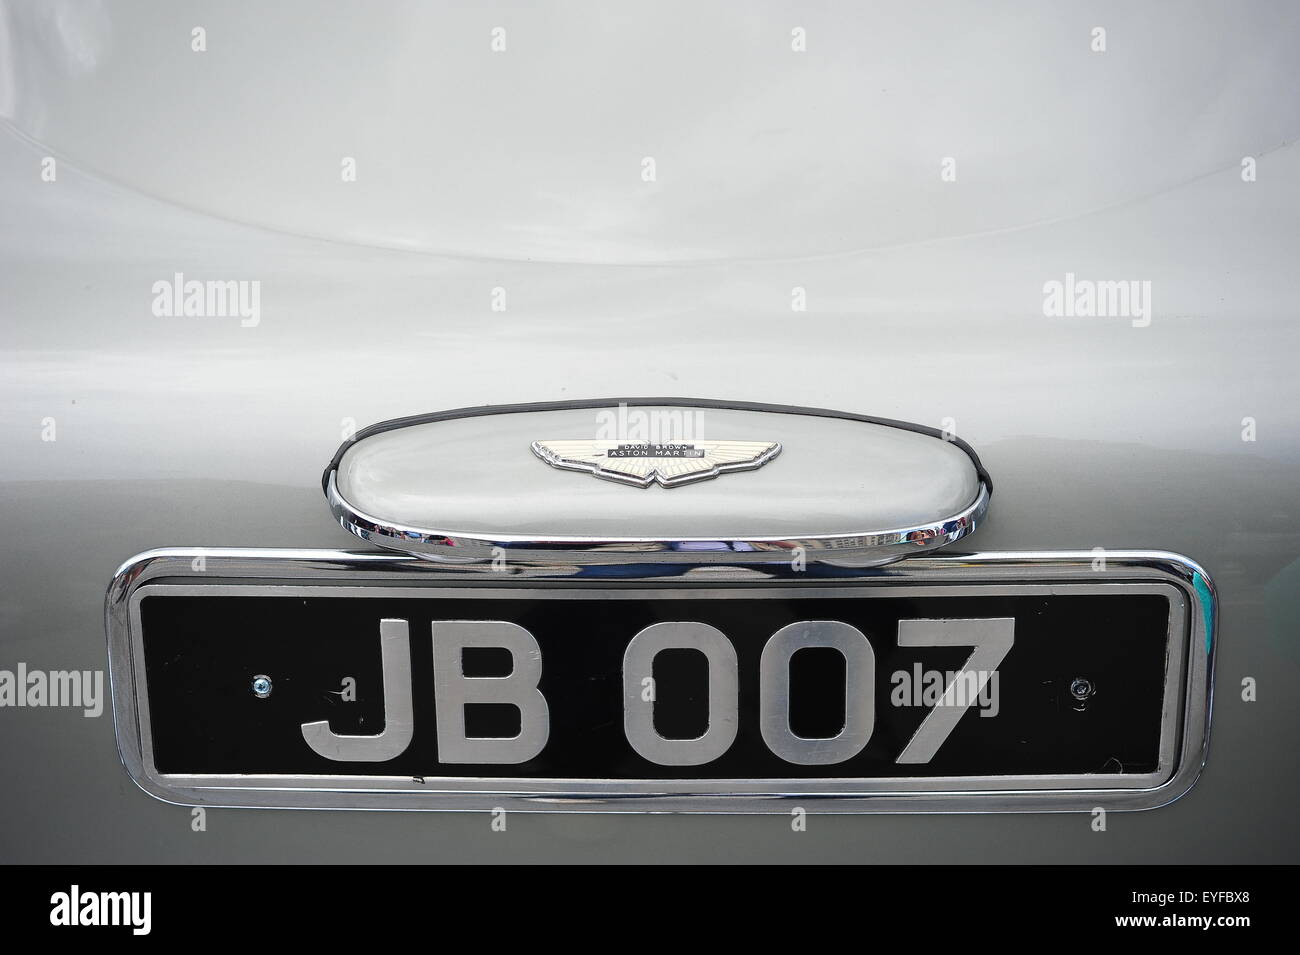 personalised james bond license plate on aston martin db5 stock